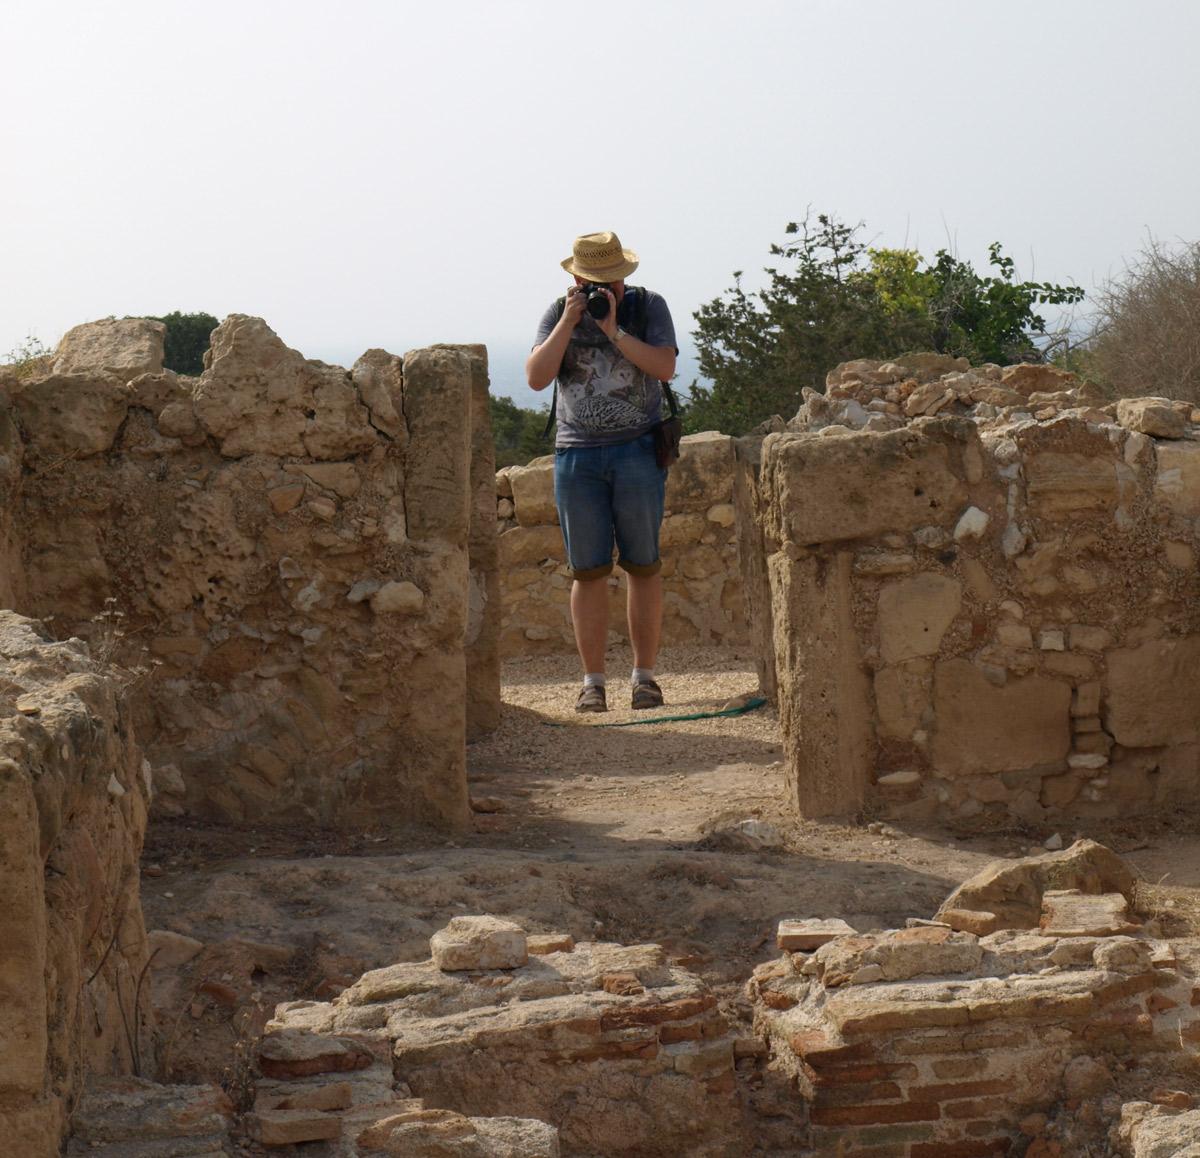 Деревня Святого Георгия, Кипр, осень 2018